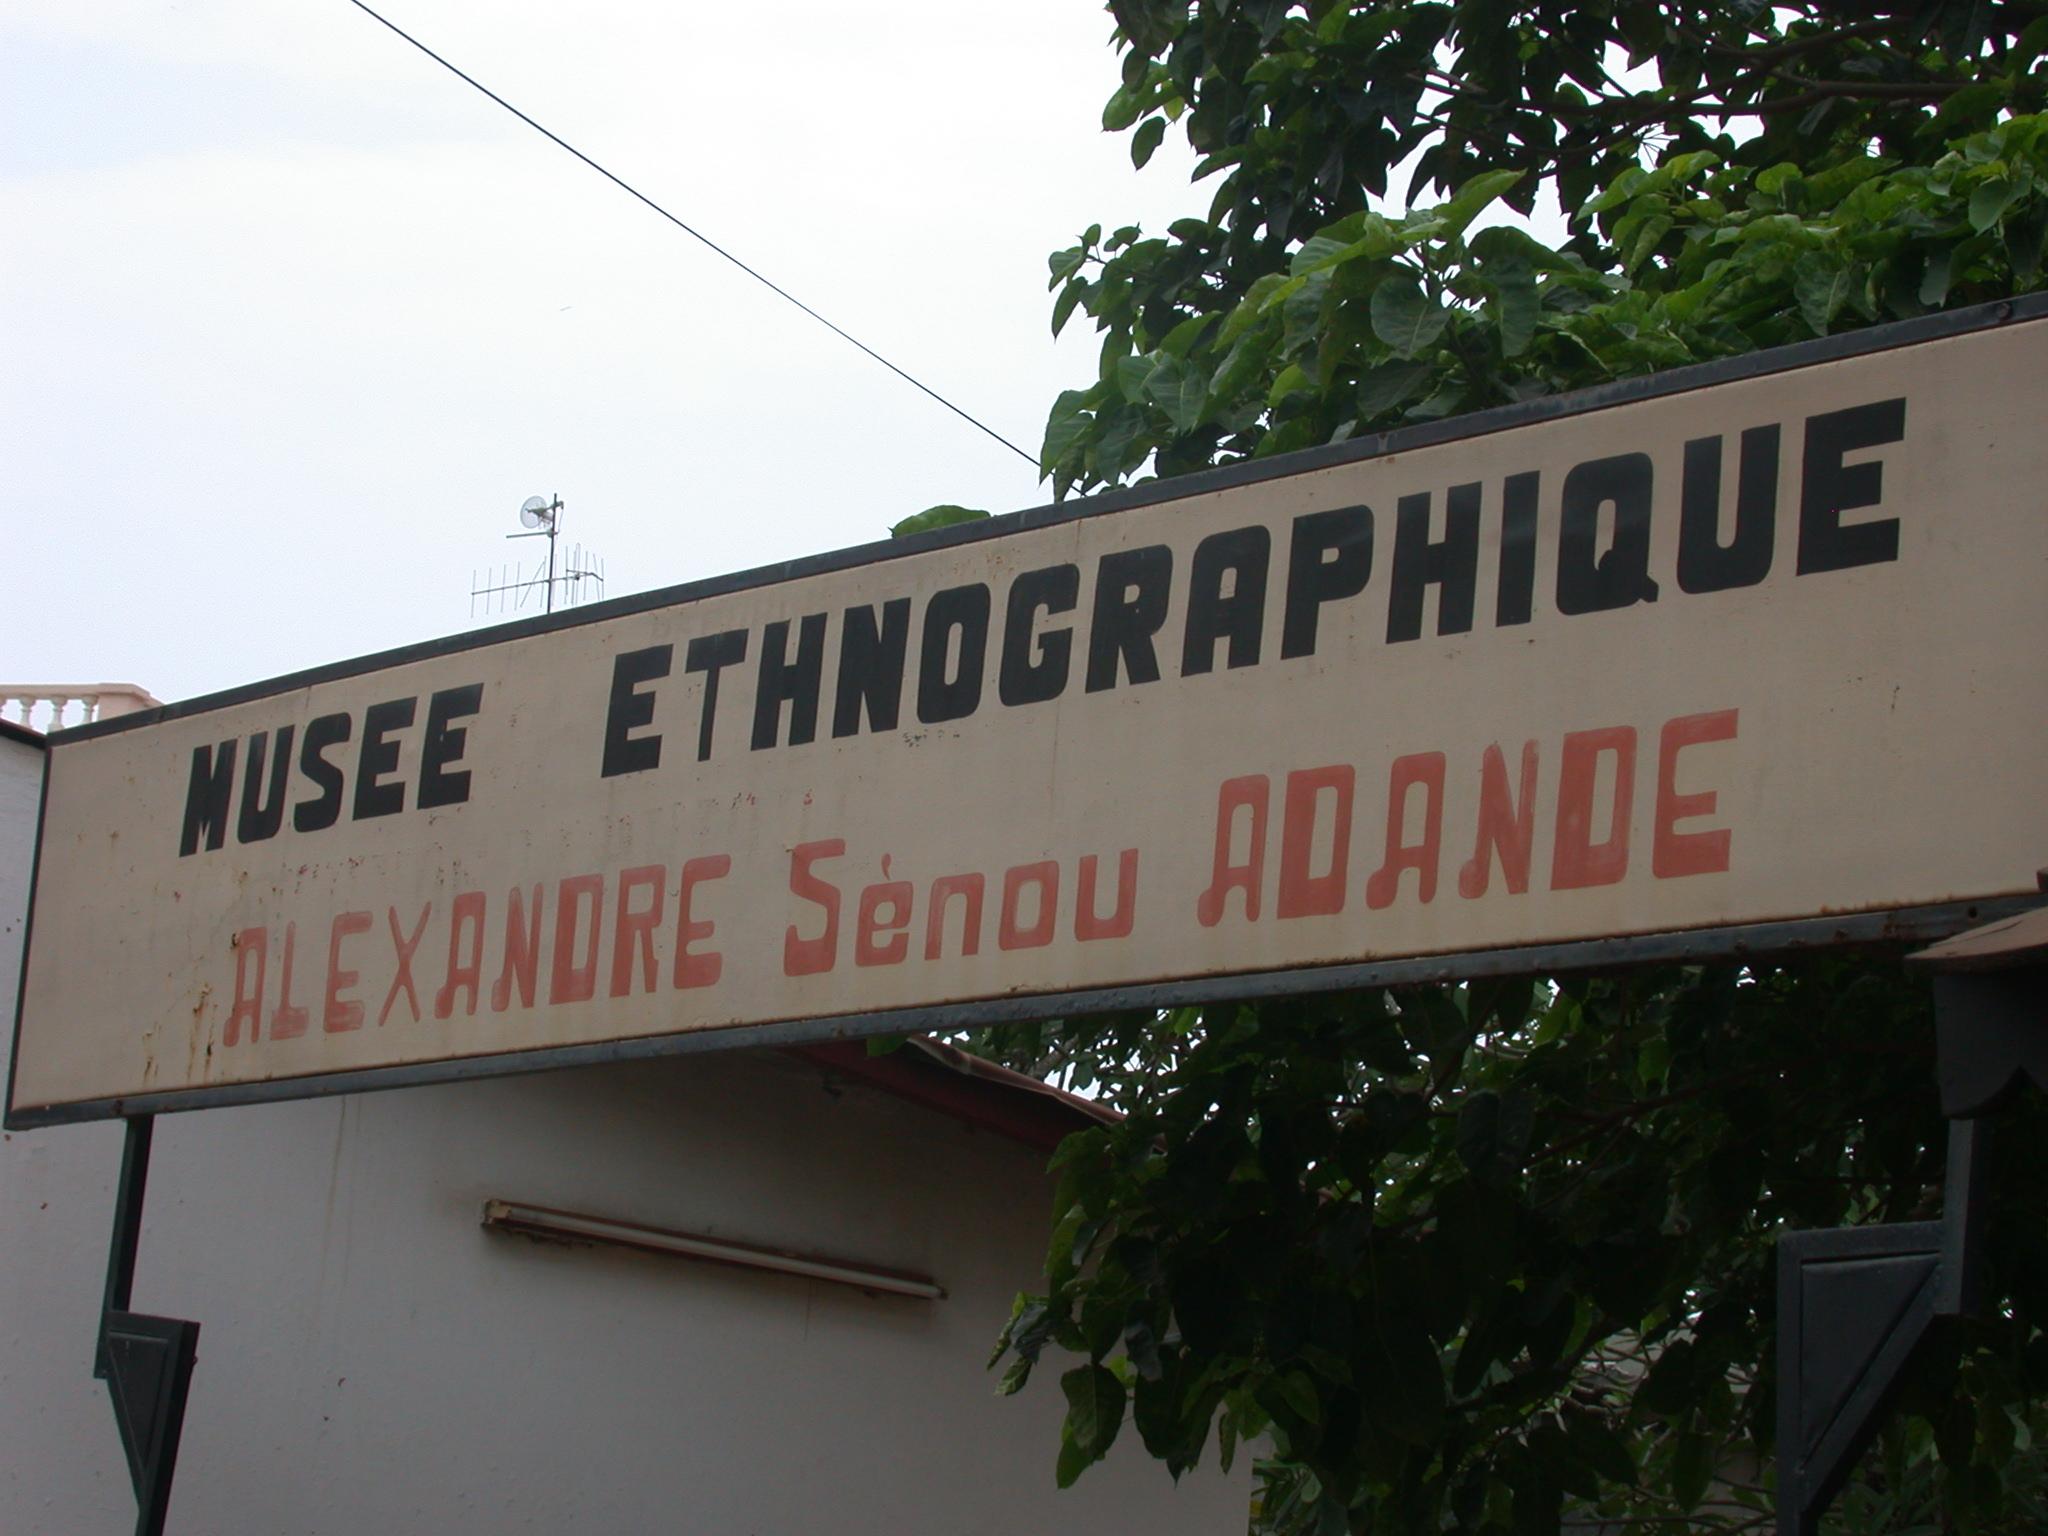 Sign for Musée Ethnographique, Porto Novo, Benin